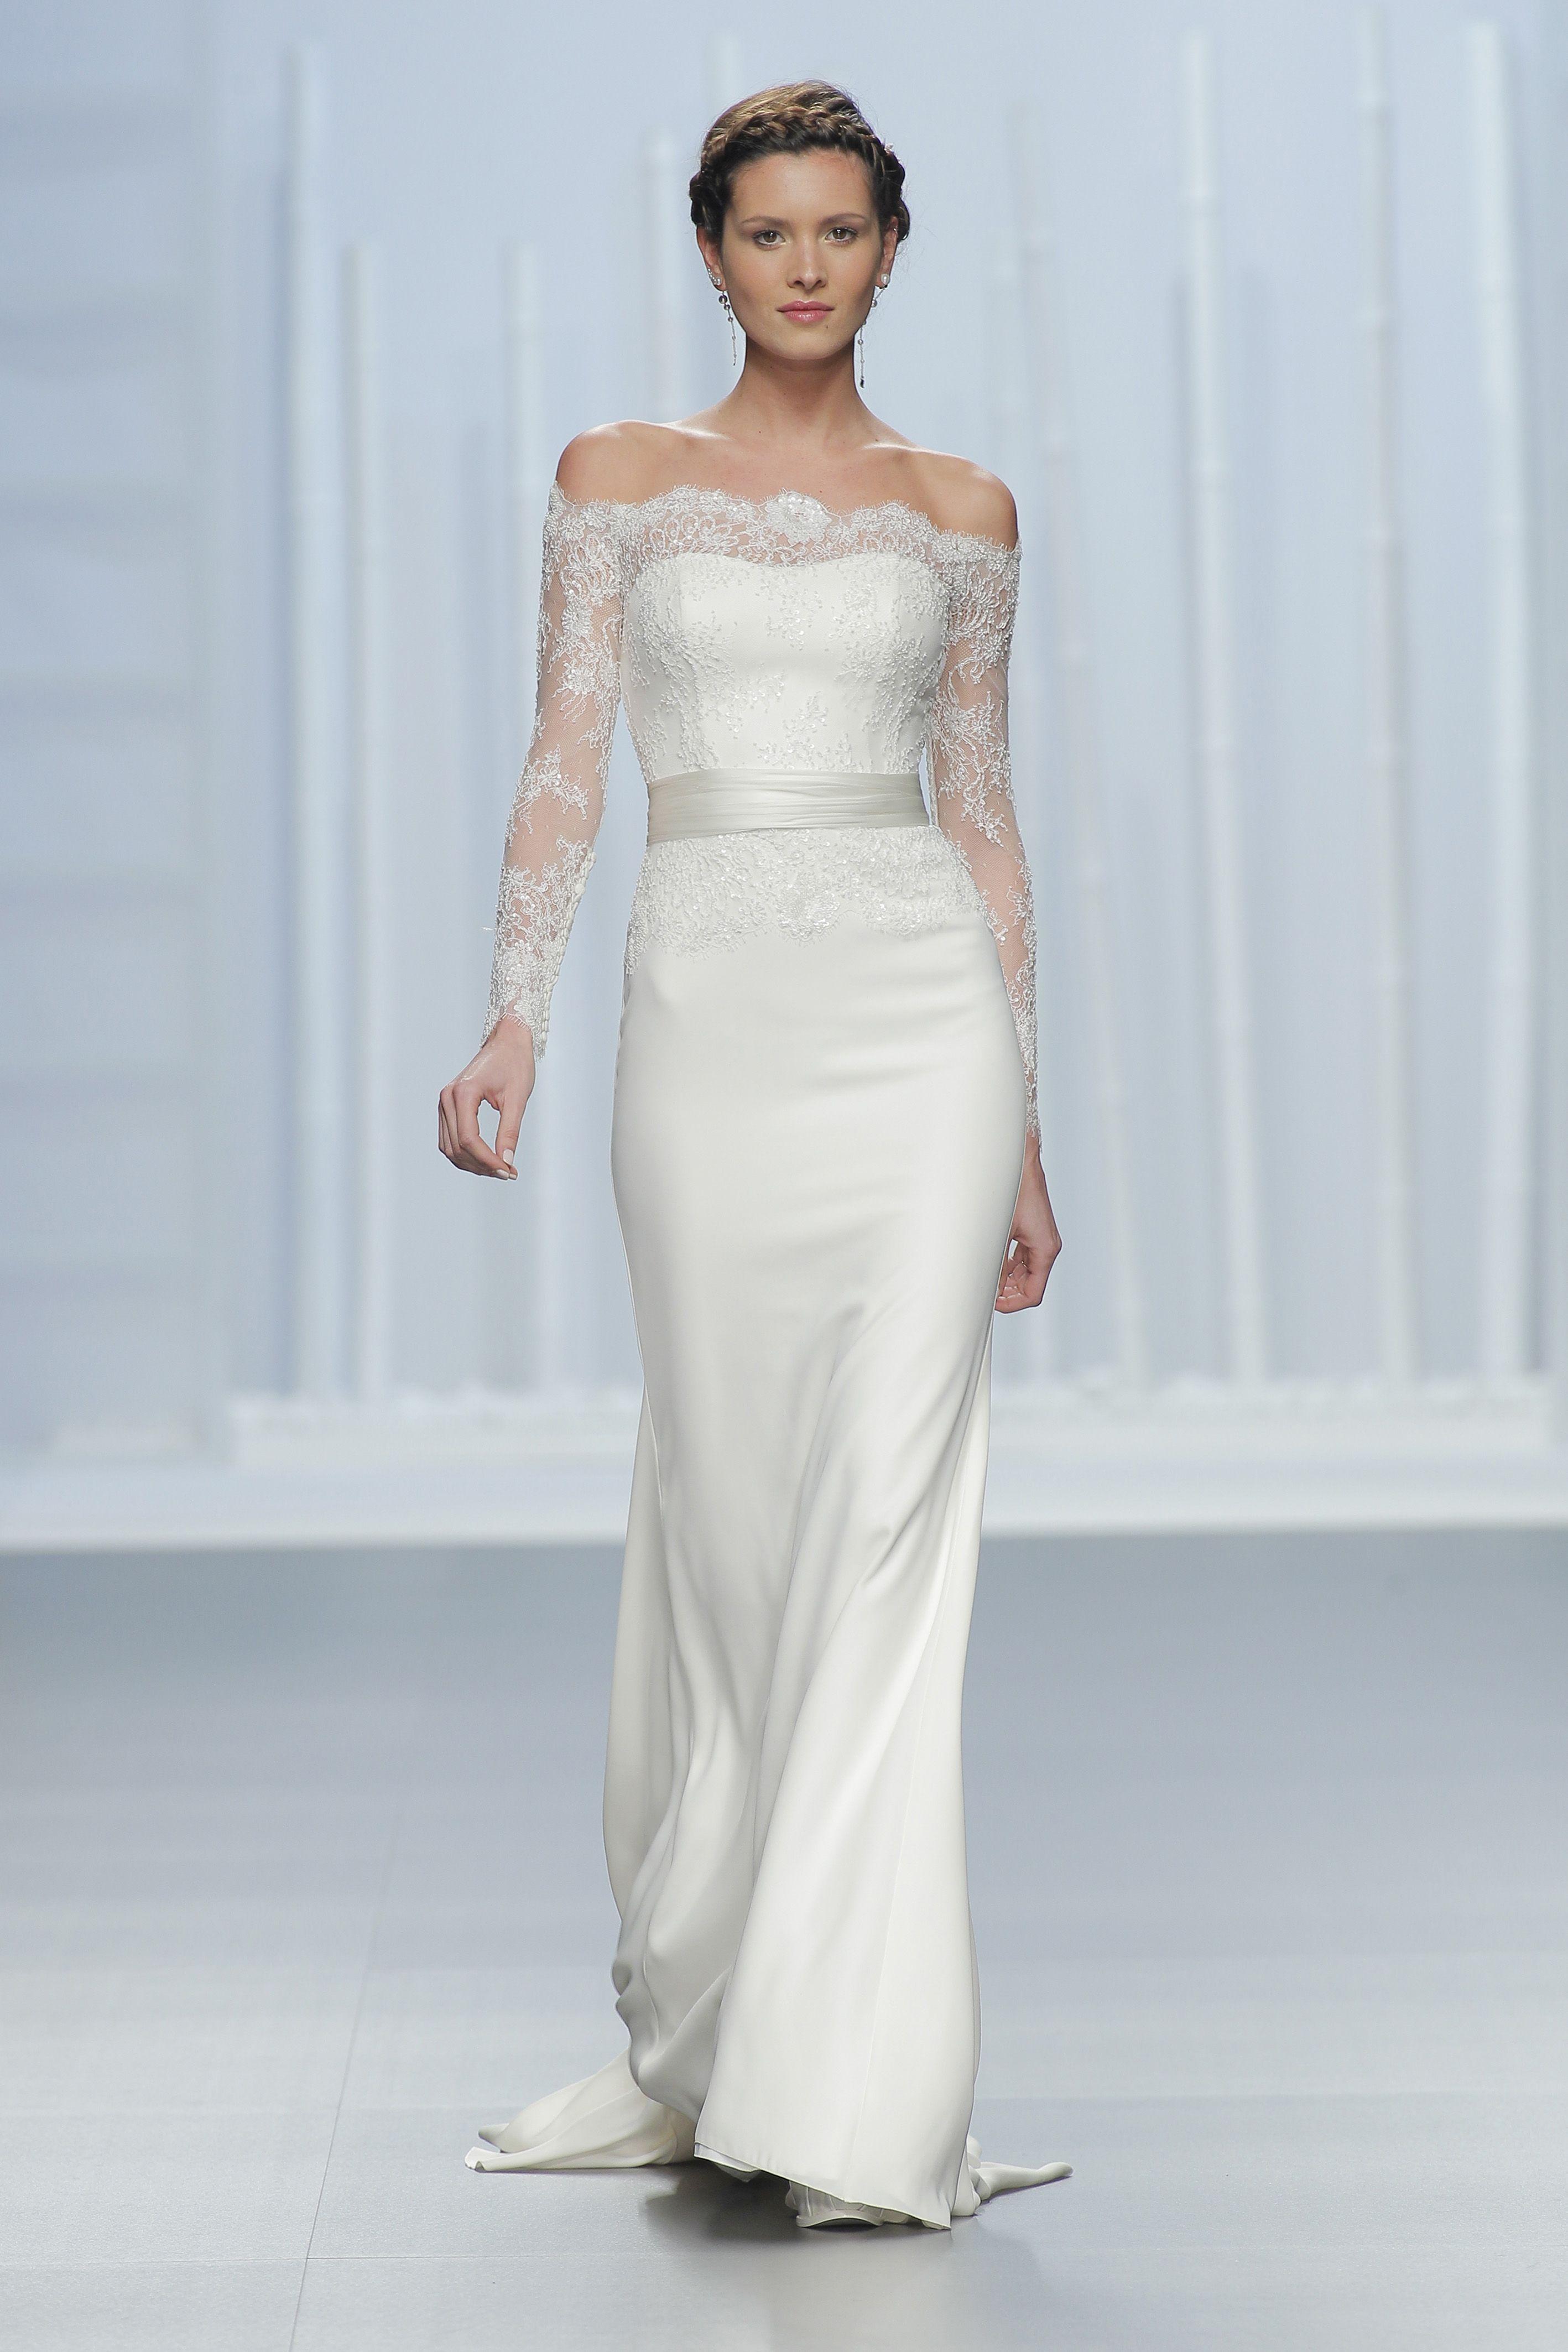 RosaClara 018 - Vestido de Novia - Rosa Clará | wedding | Pinterest ...